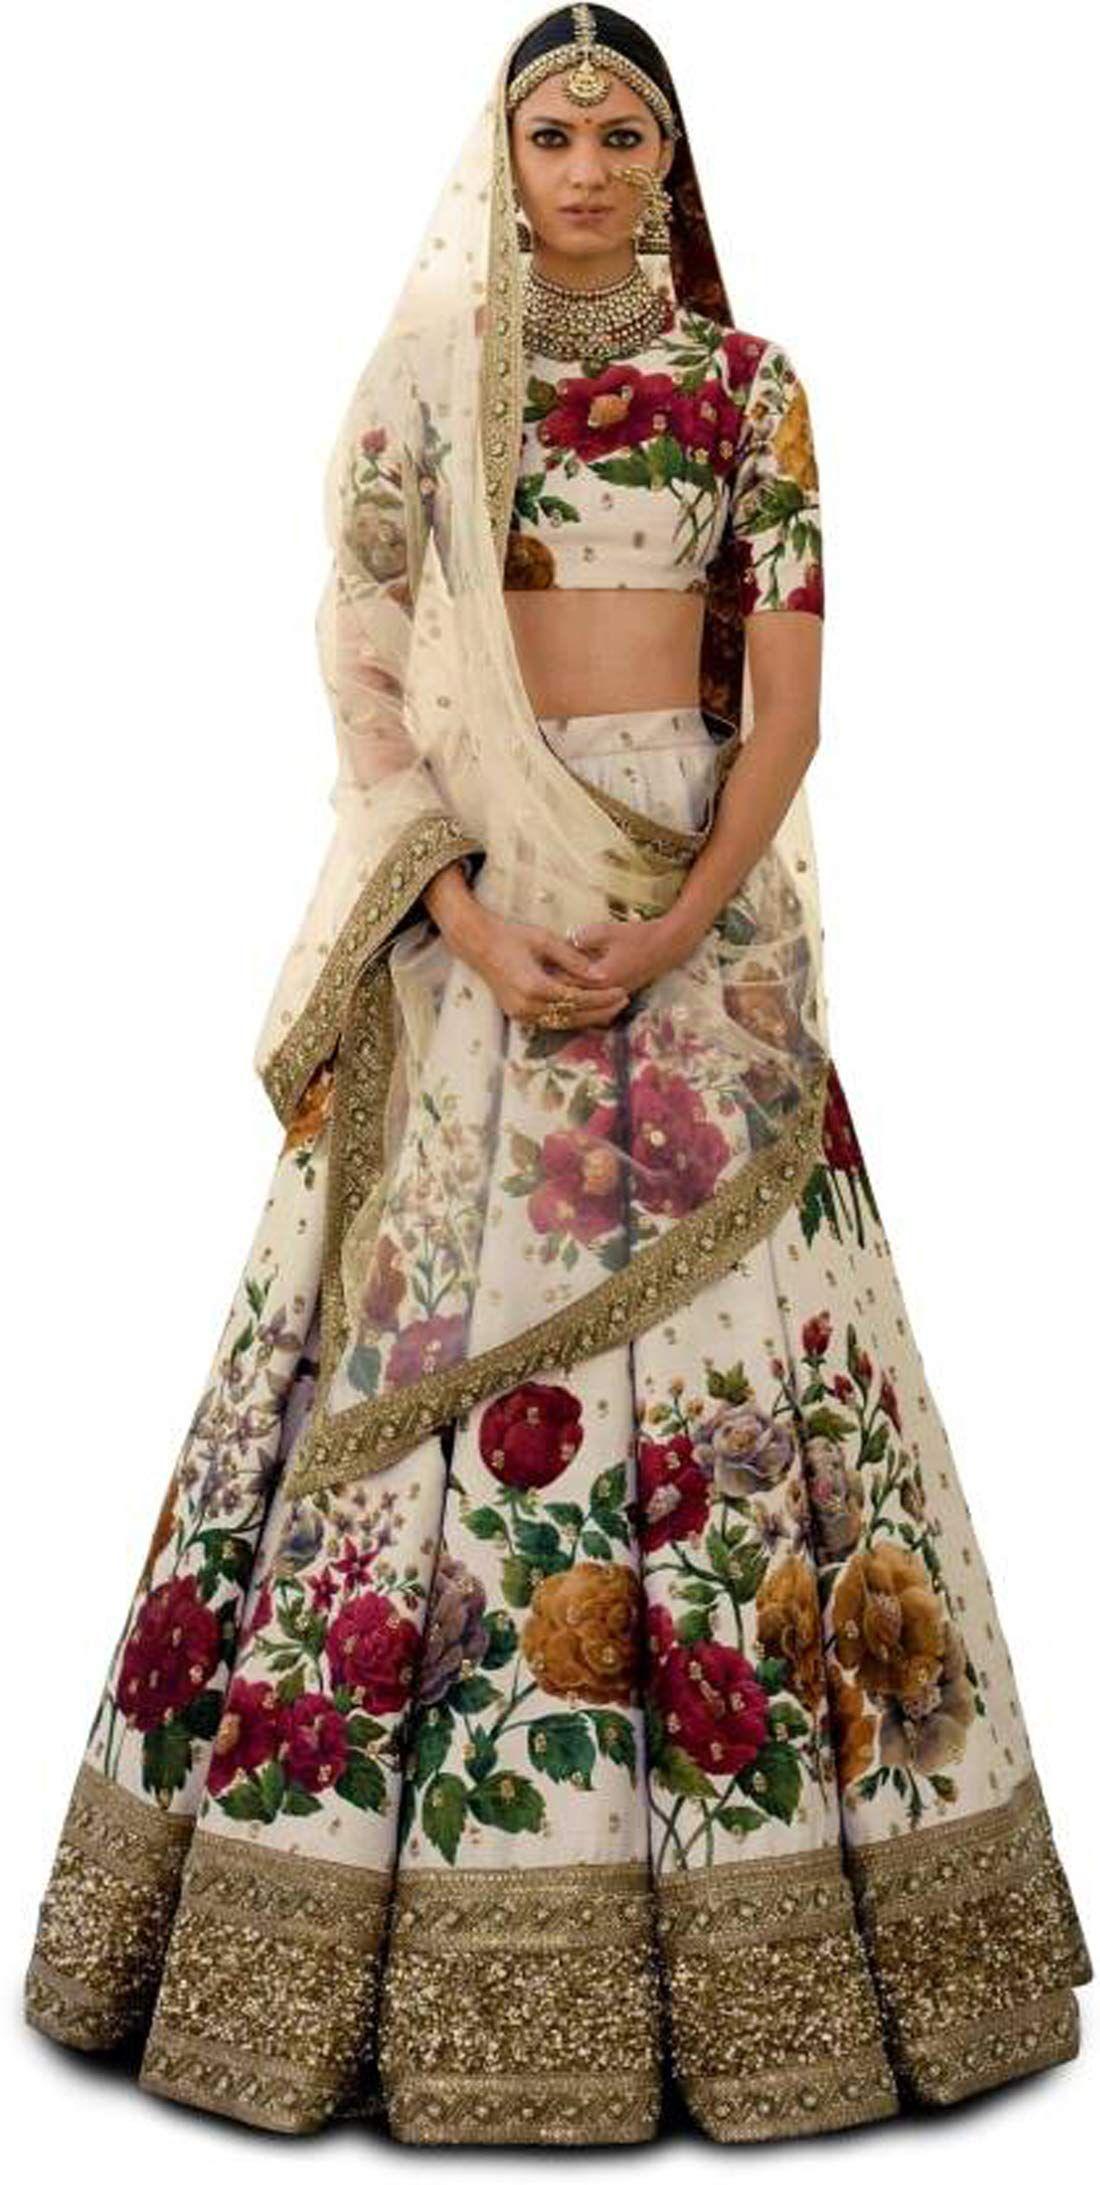 8339c33f4 Next-Enterprise-womens-Embroidered-Floral-Print-Semi-Stitched-lehengas- lehenga-choli-SBE-01FreeSize